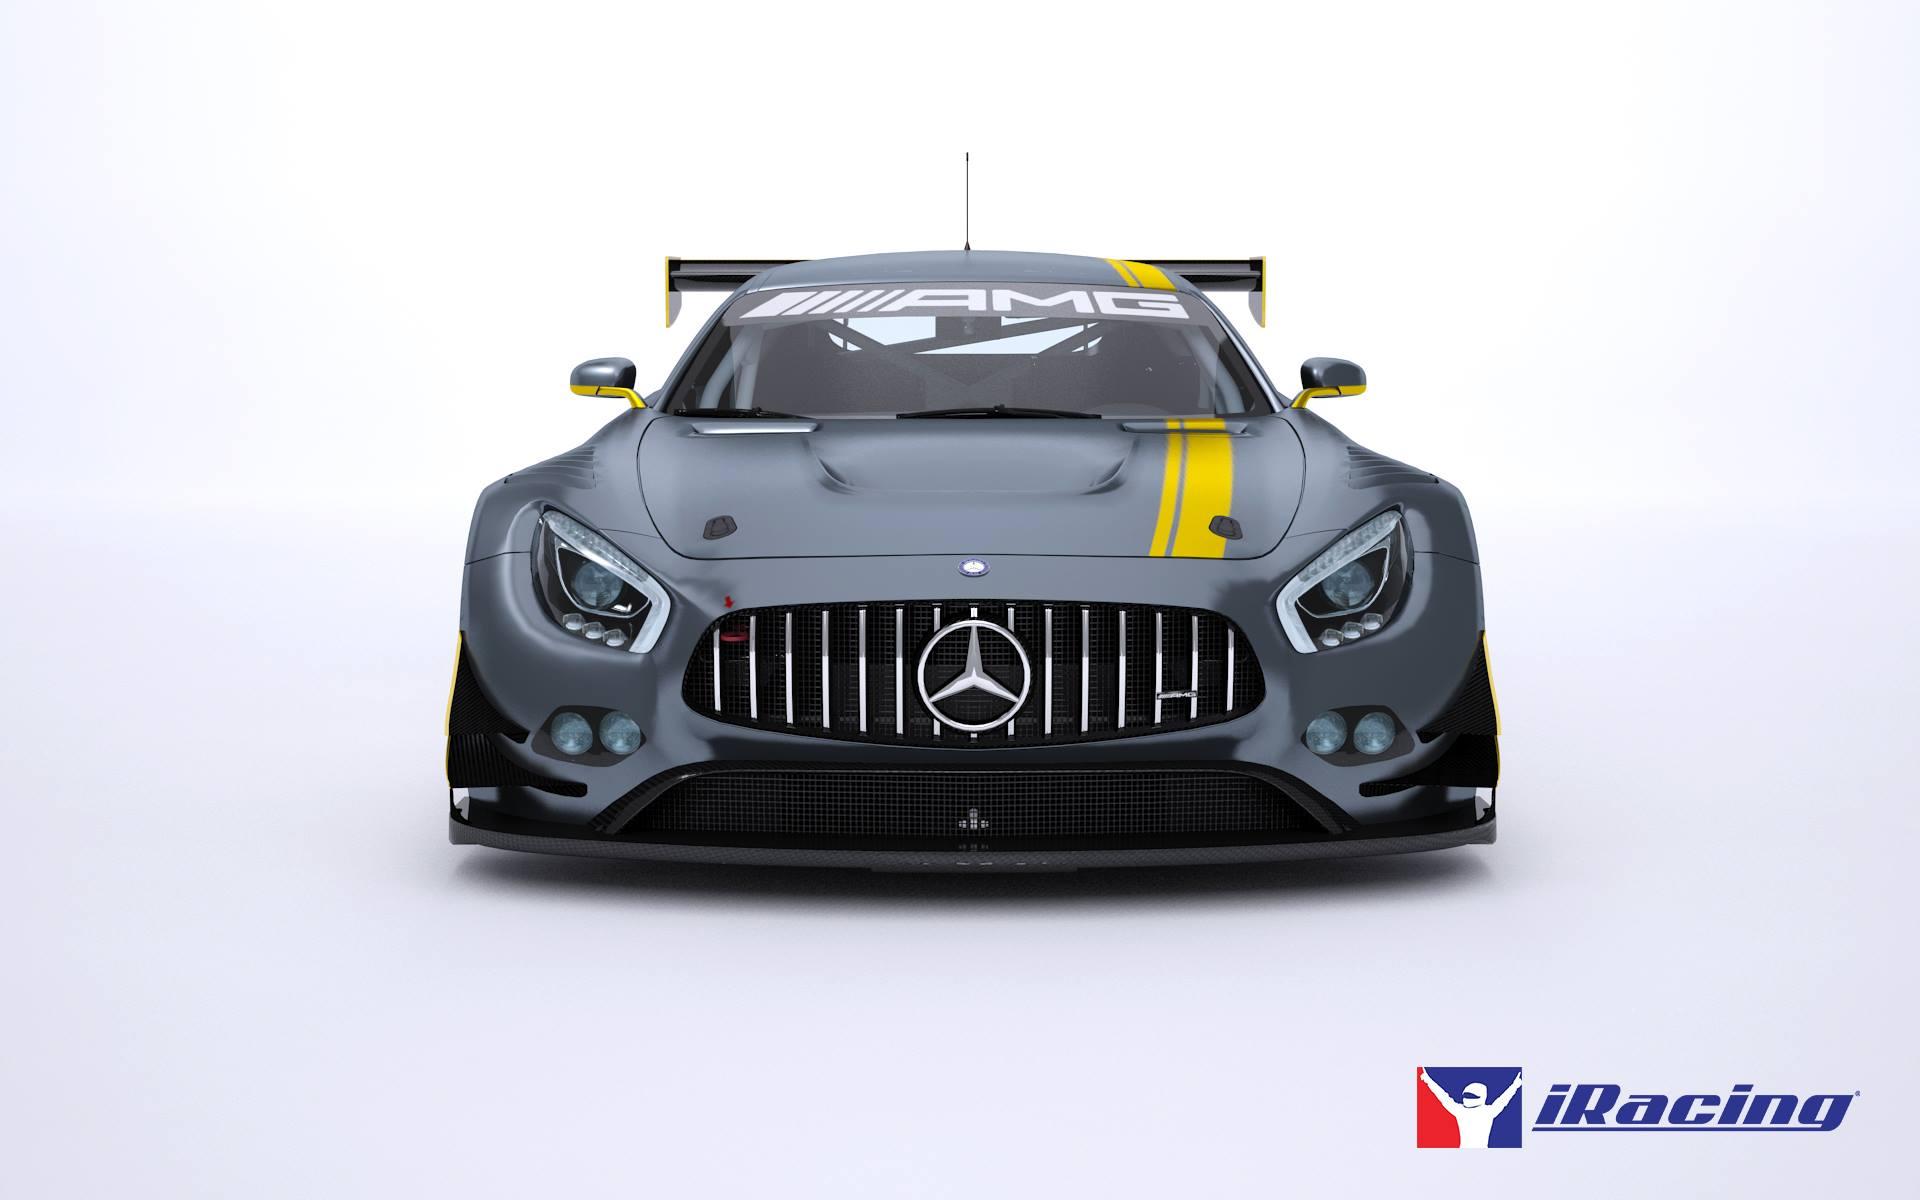 2016-mercedes-amg-gt3-race-car 1.jpg